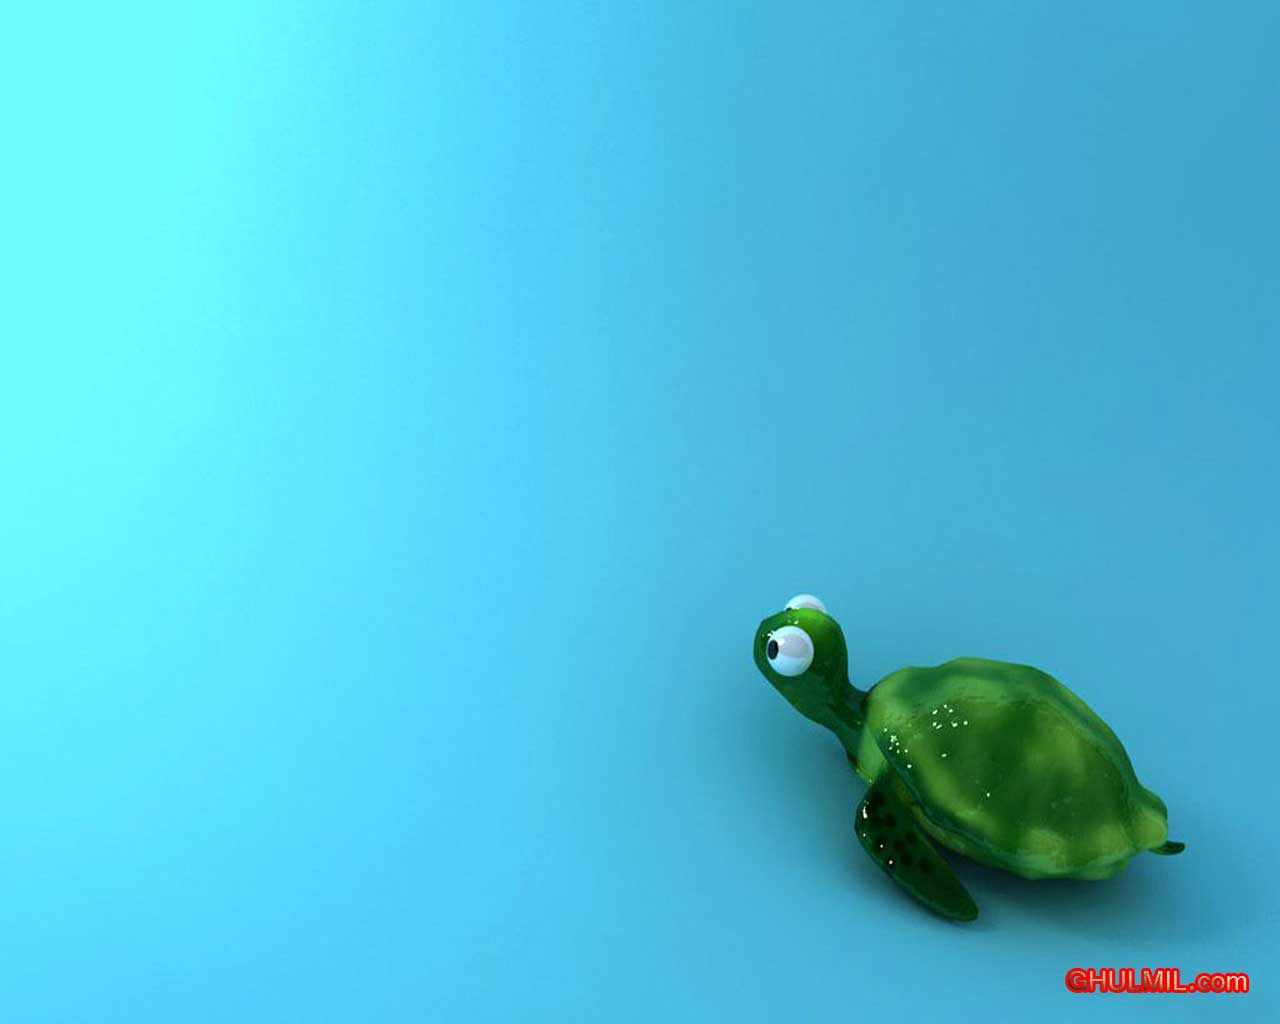 Cute Background Picture - WallpaperSafari